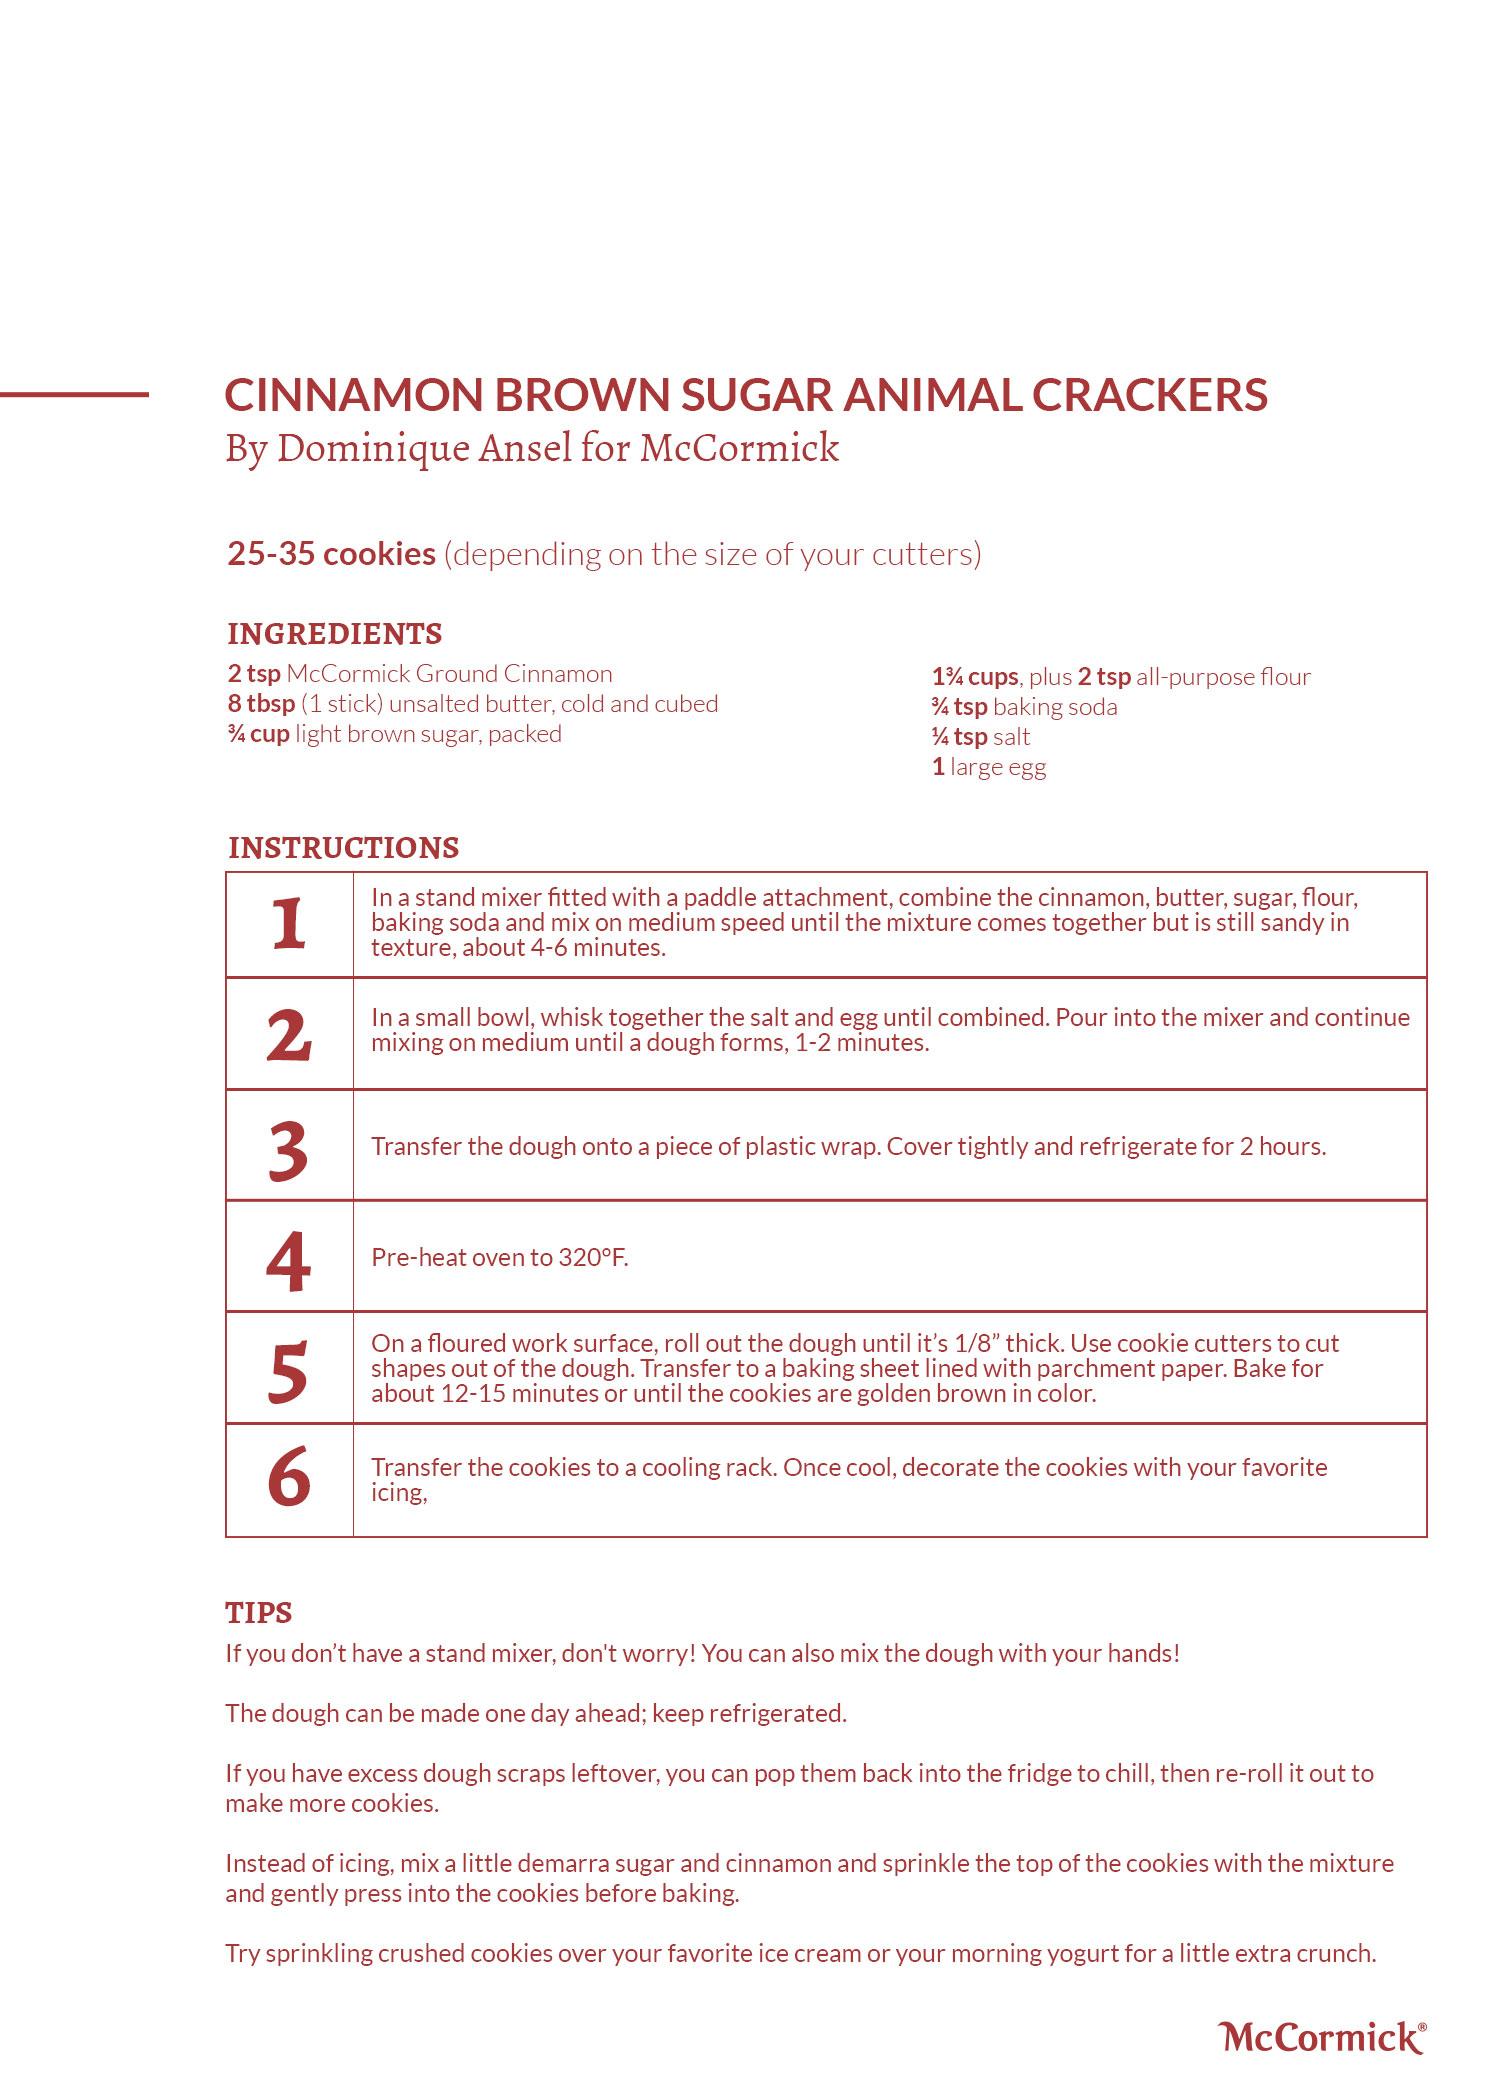 Cinnamon Brown Sugar Animal Crackers Recipe